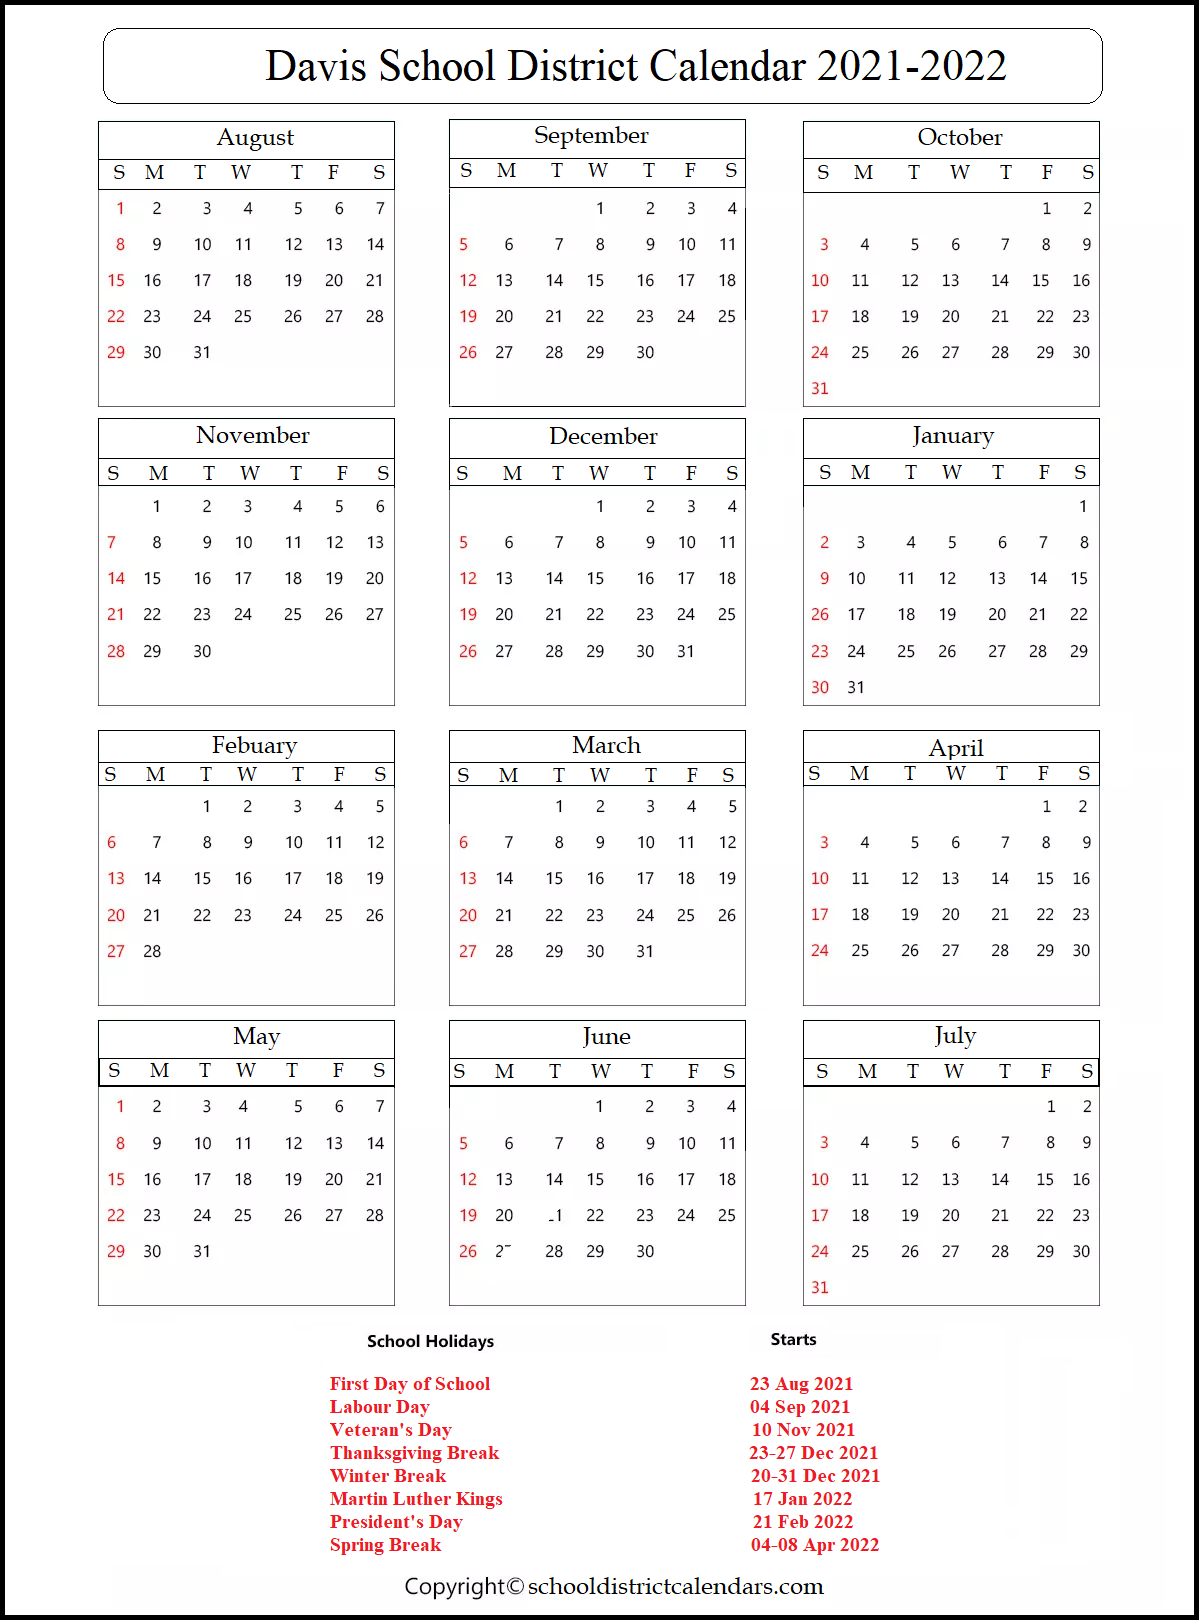 Davis School District Calendar 2021-2022